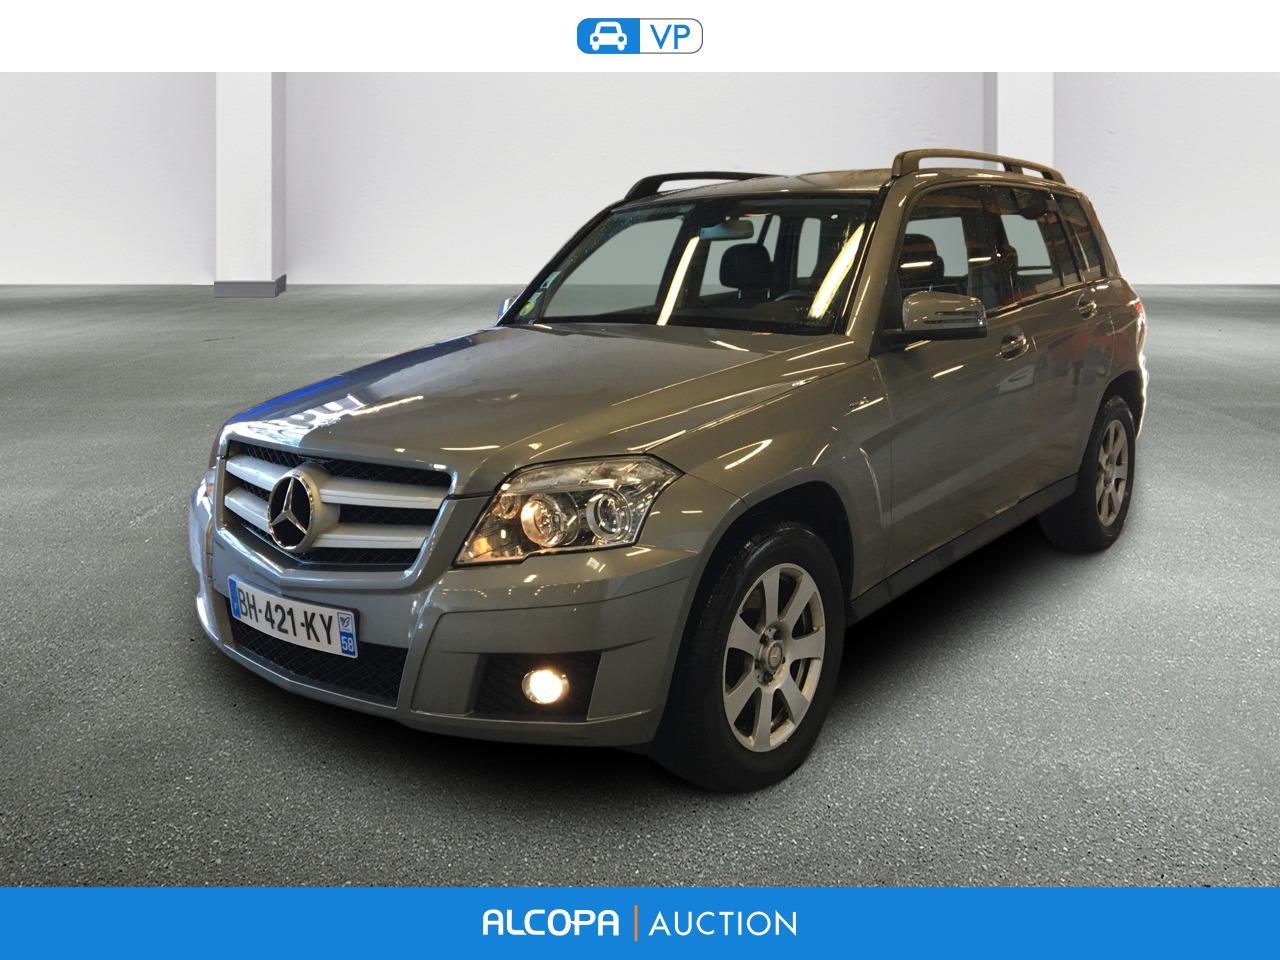 Mercedes Glk 200 Cdi Alcopa Auction